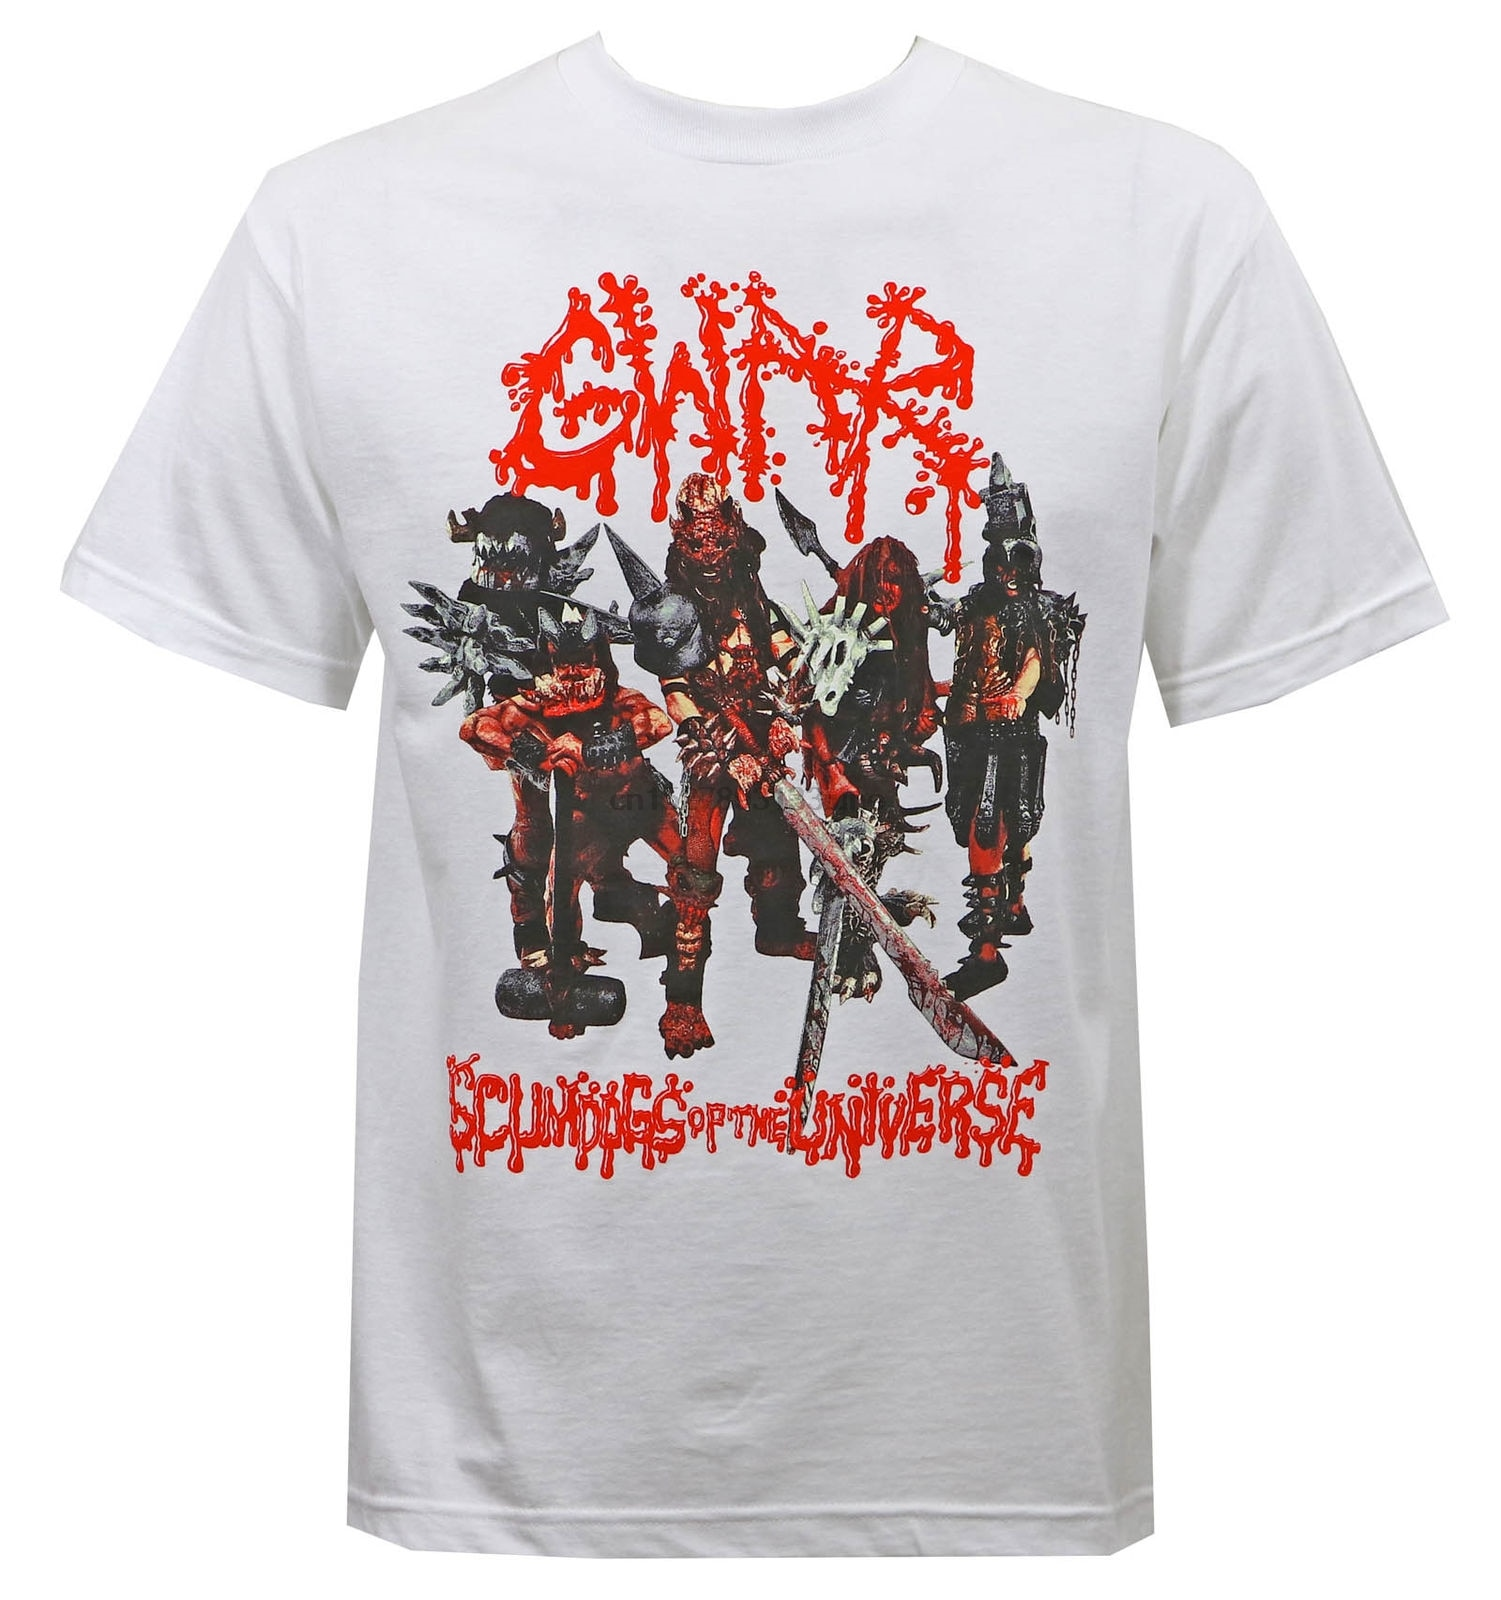 Auténtica GWAR Band Scumdogs of The camiseta de universo S M L XL 2XL 3XL nuevas camisetas para hombre de manga corta tendencia ropa camiseta superior